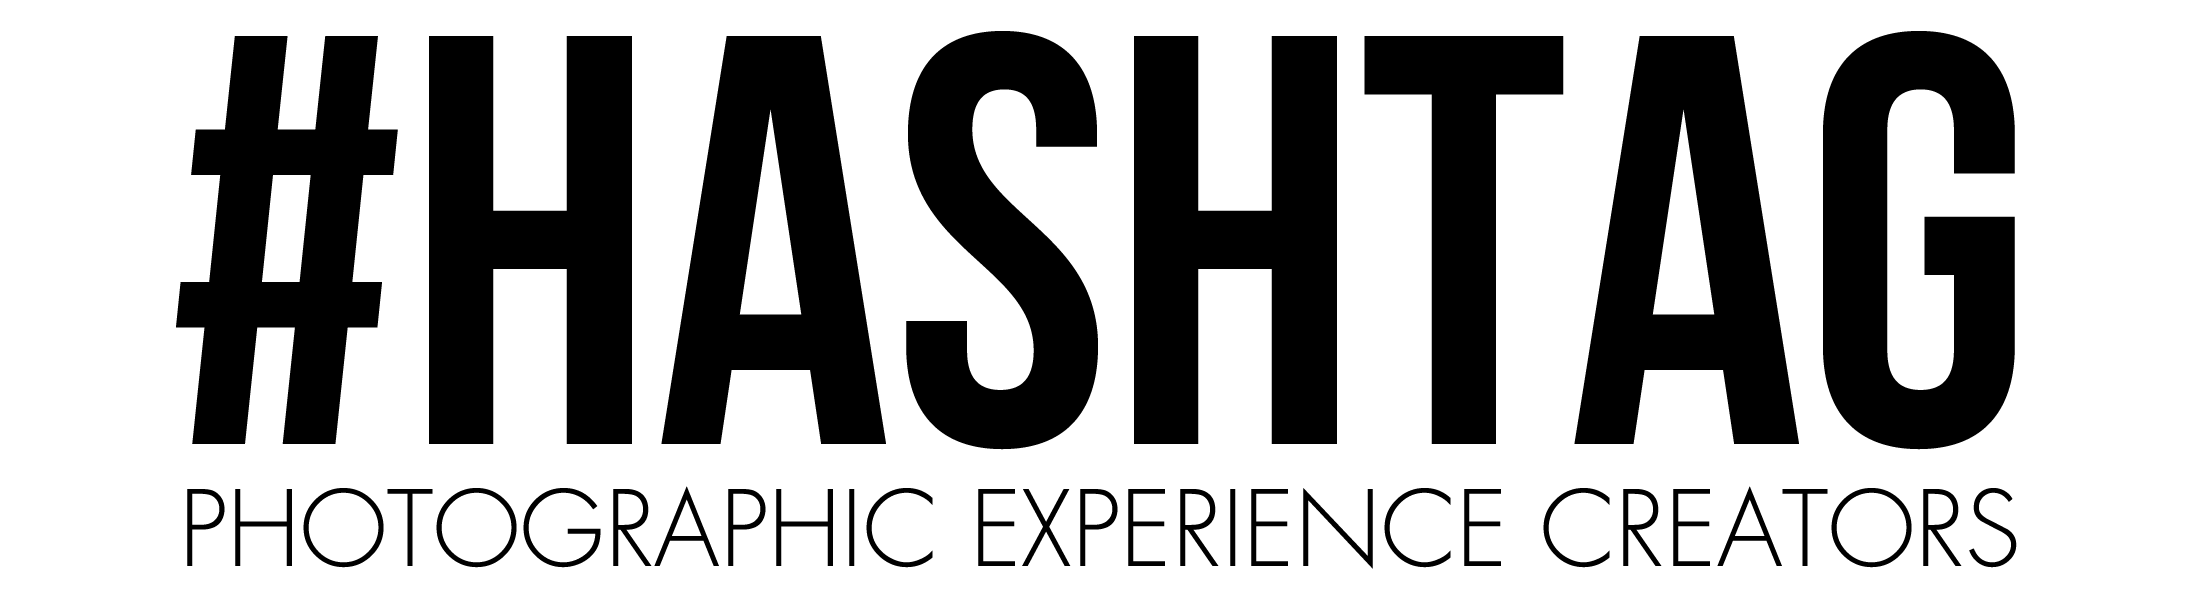 #HASHTAG Logo